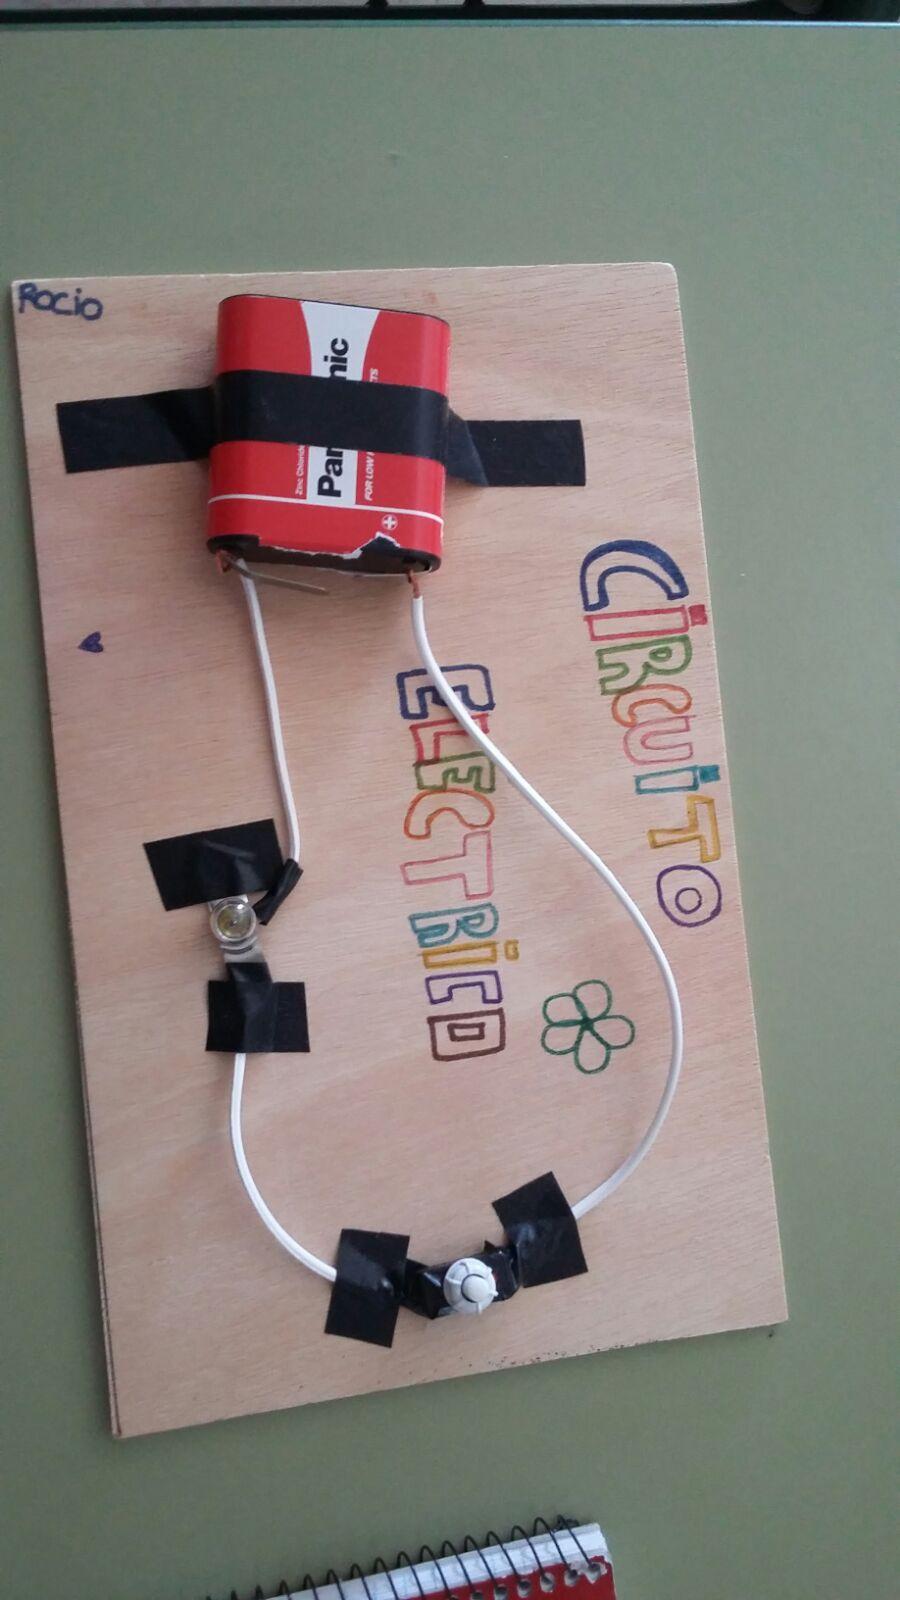 Circuito Electrico Basico : Circuito electrico basico manualidad bazar james la pintana